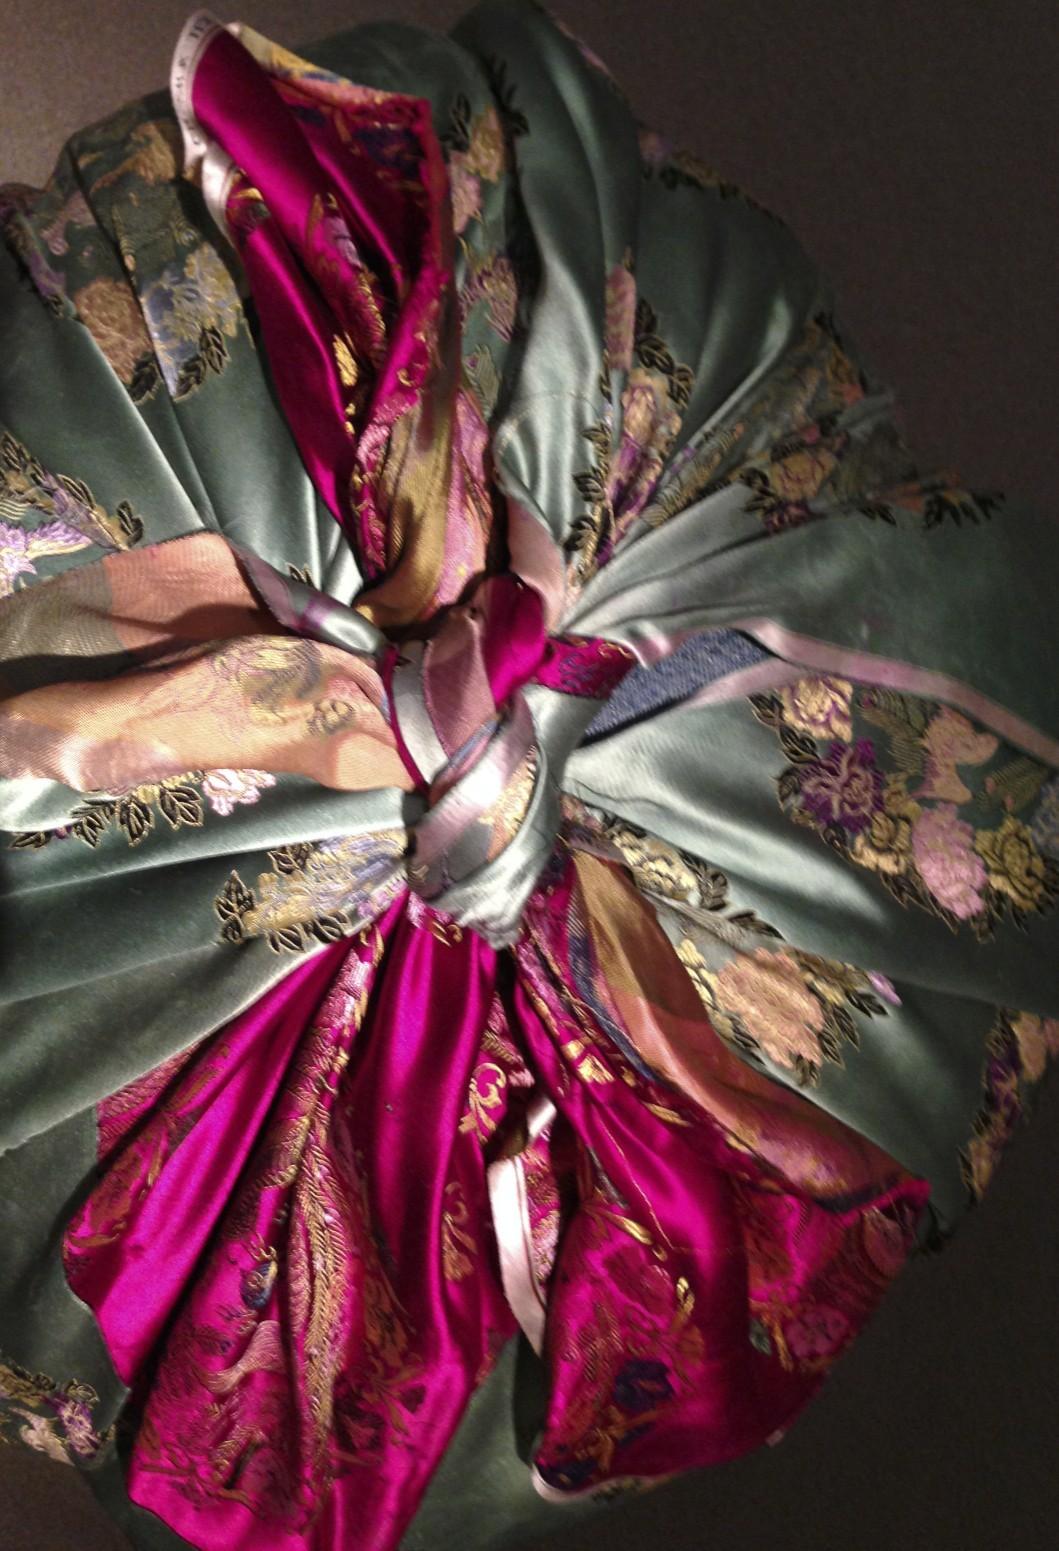 kimmsooja unfolding exhibition visited by gulf islands artist barbra edwards